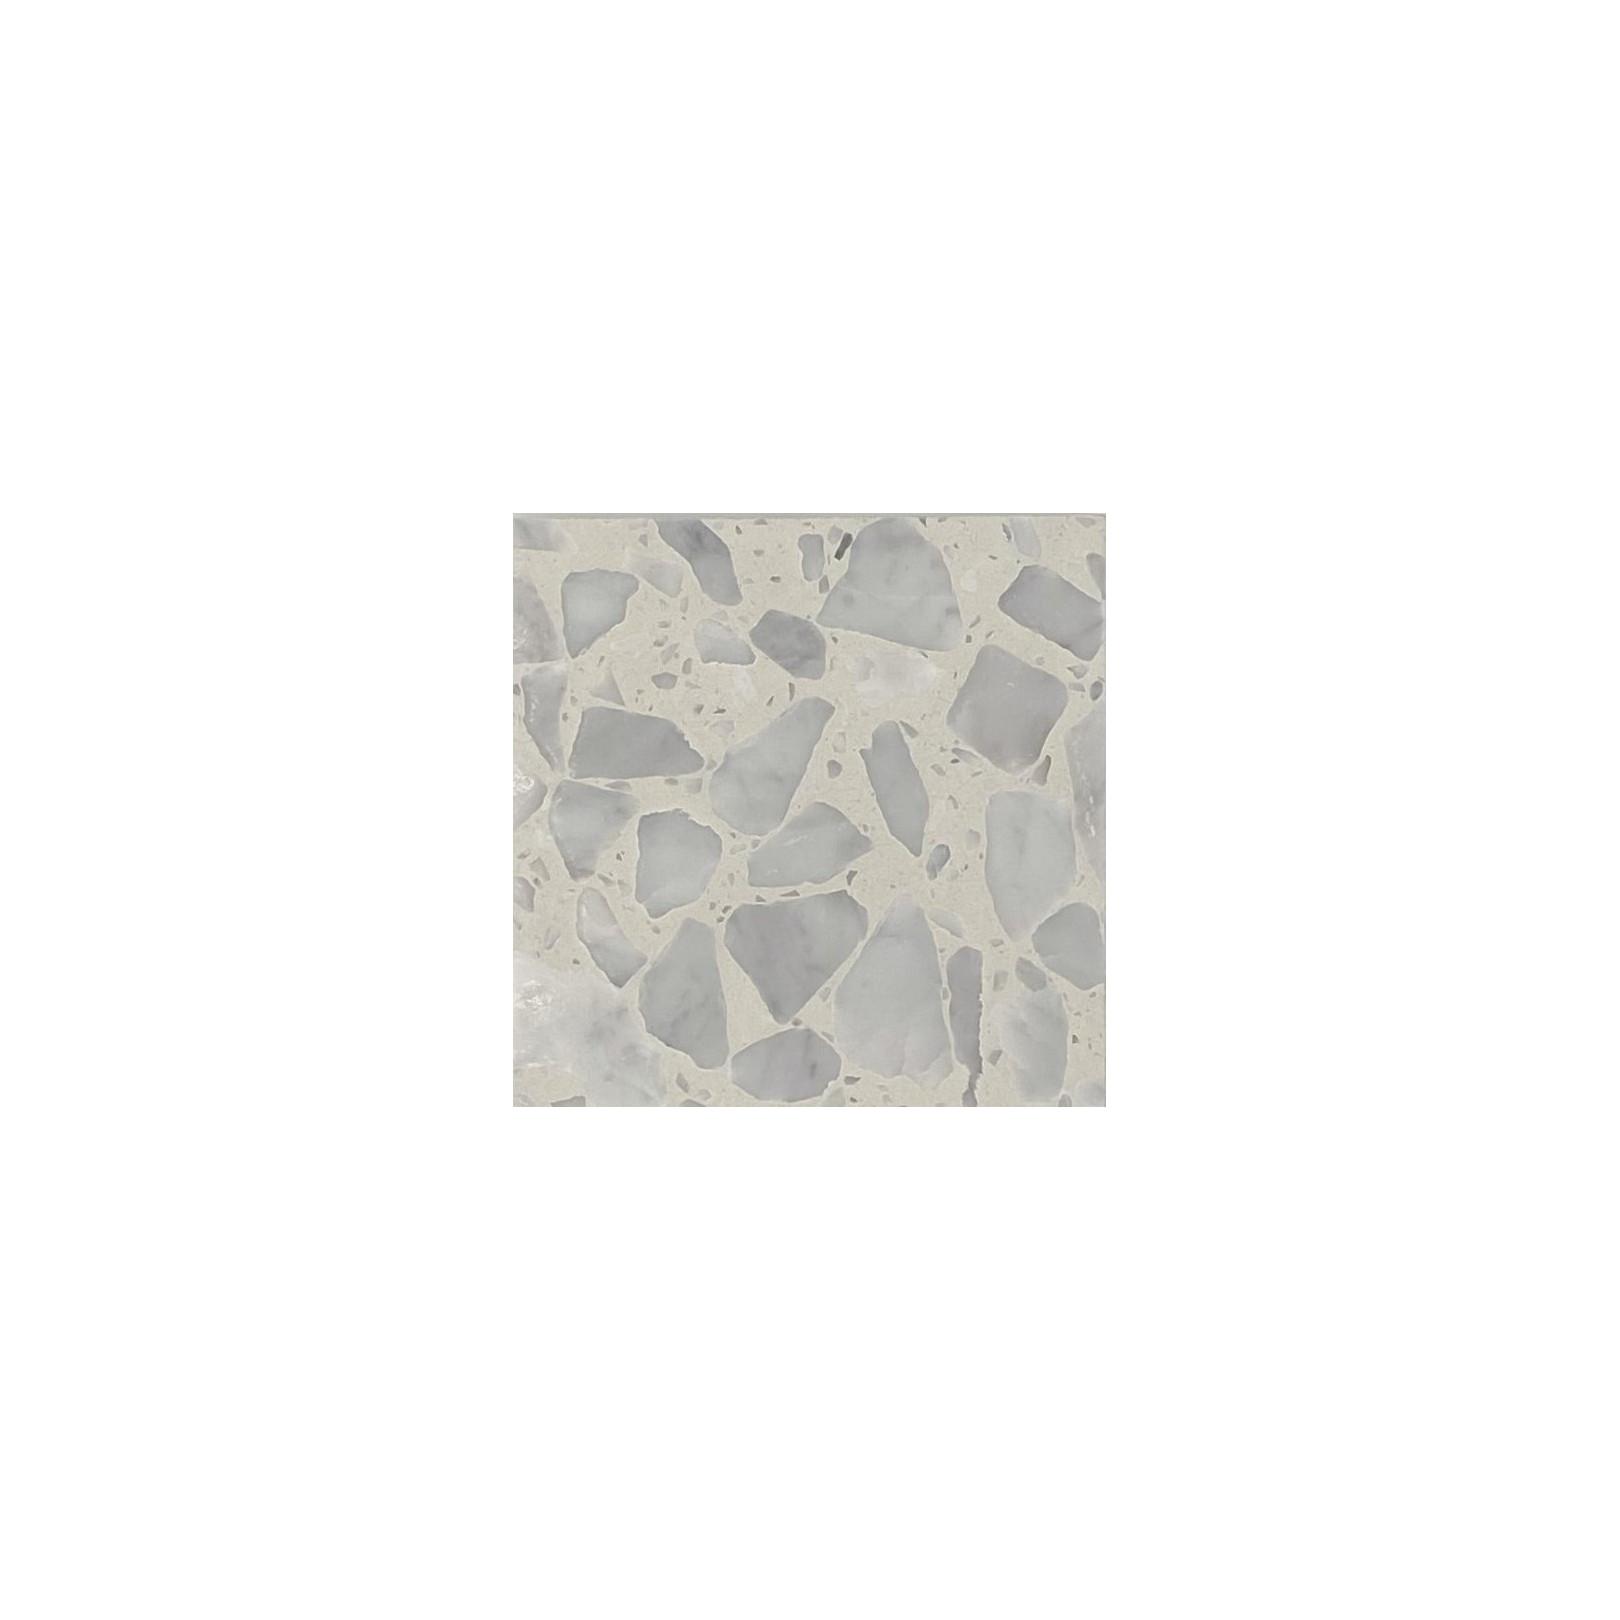 Carreau Terrazzo fond blanc inclusions gris Bianco Neve (3 formats)